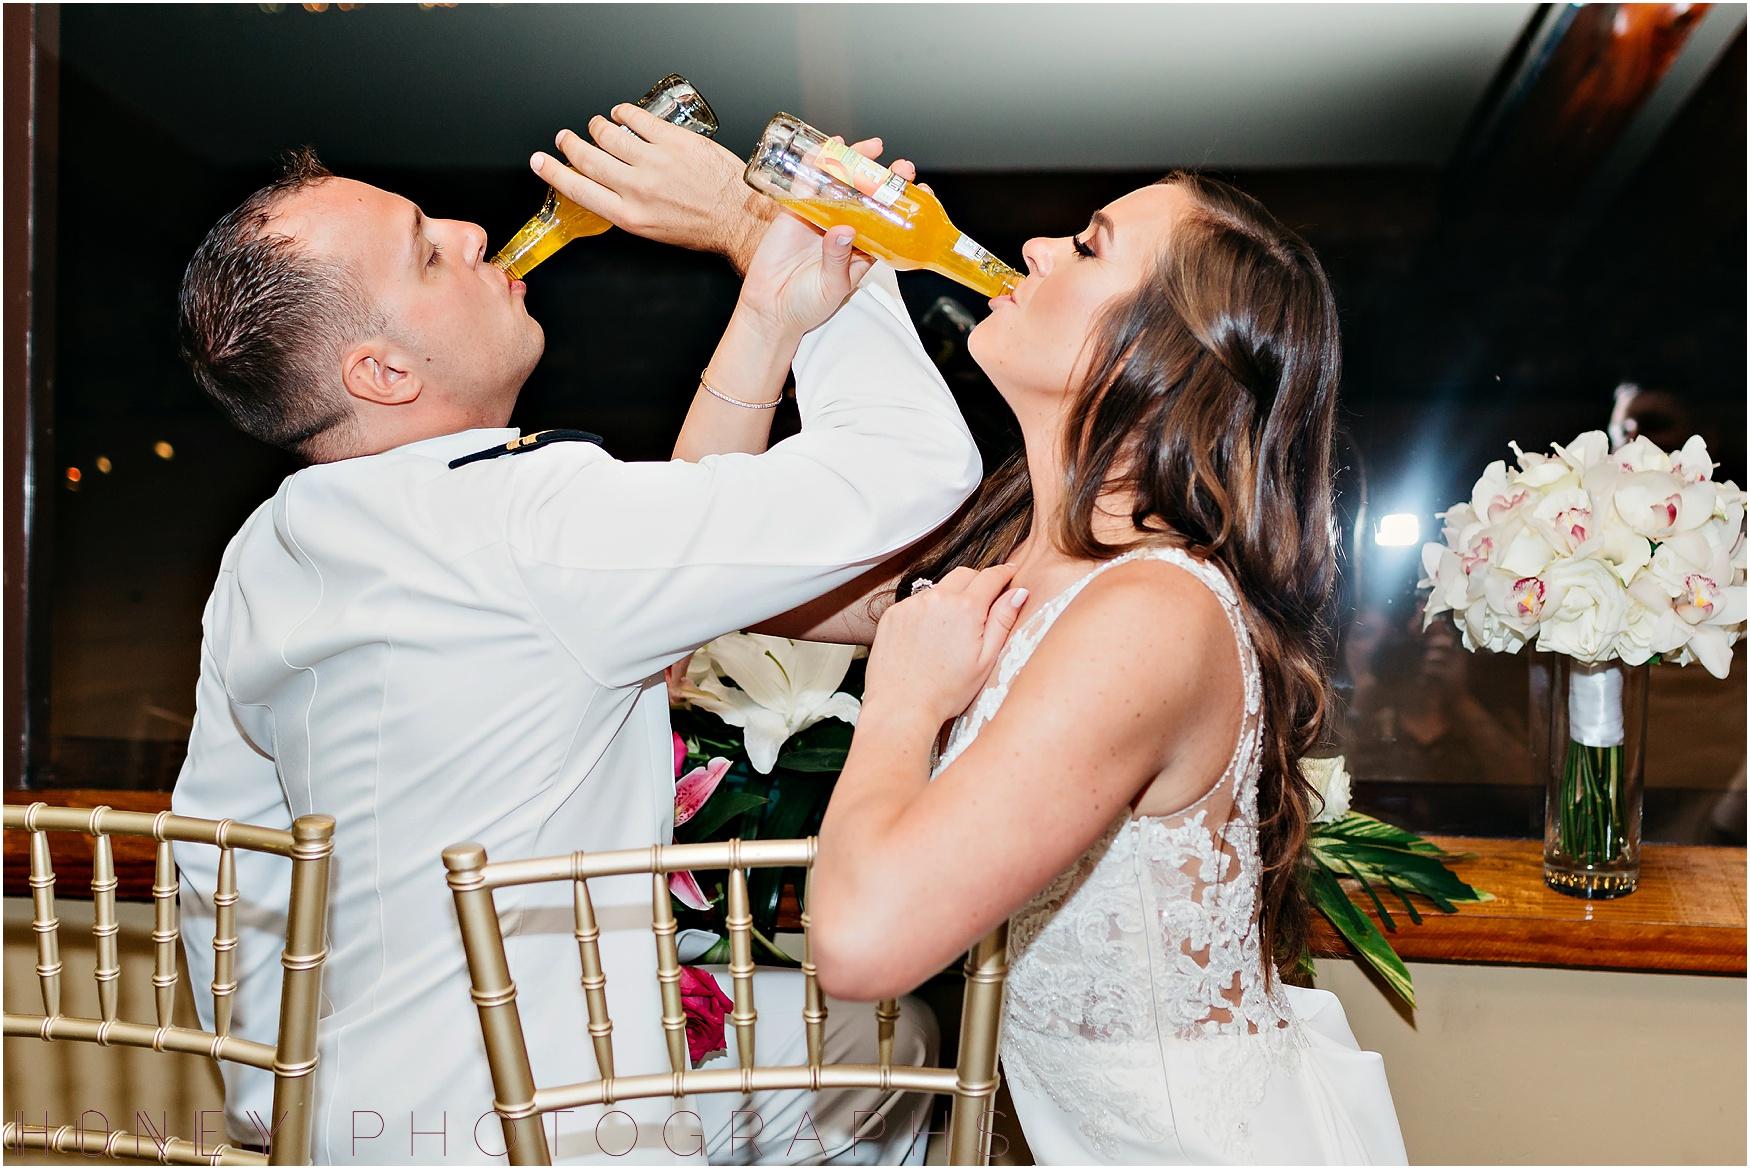 bali-hai-tropical-bubble-exit-party-paradise-wedding064.jpg